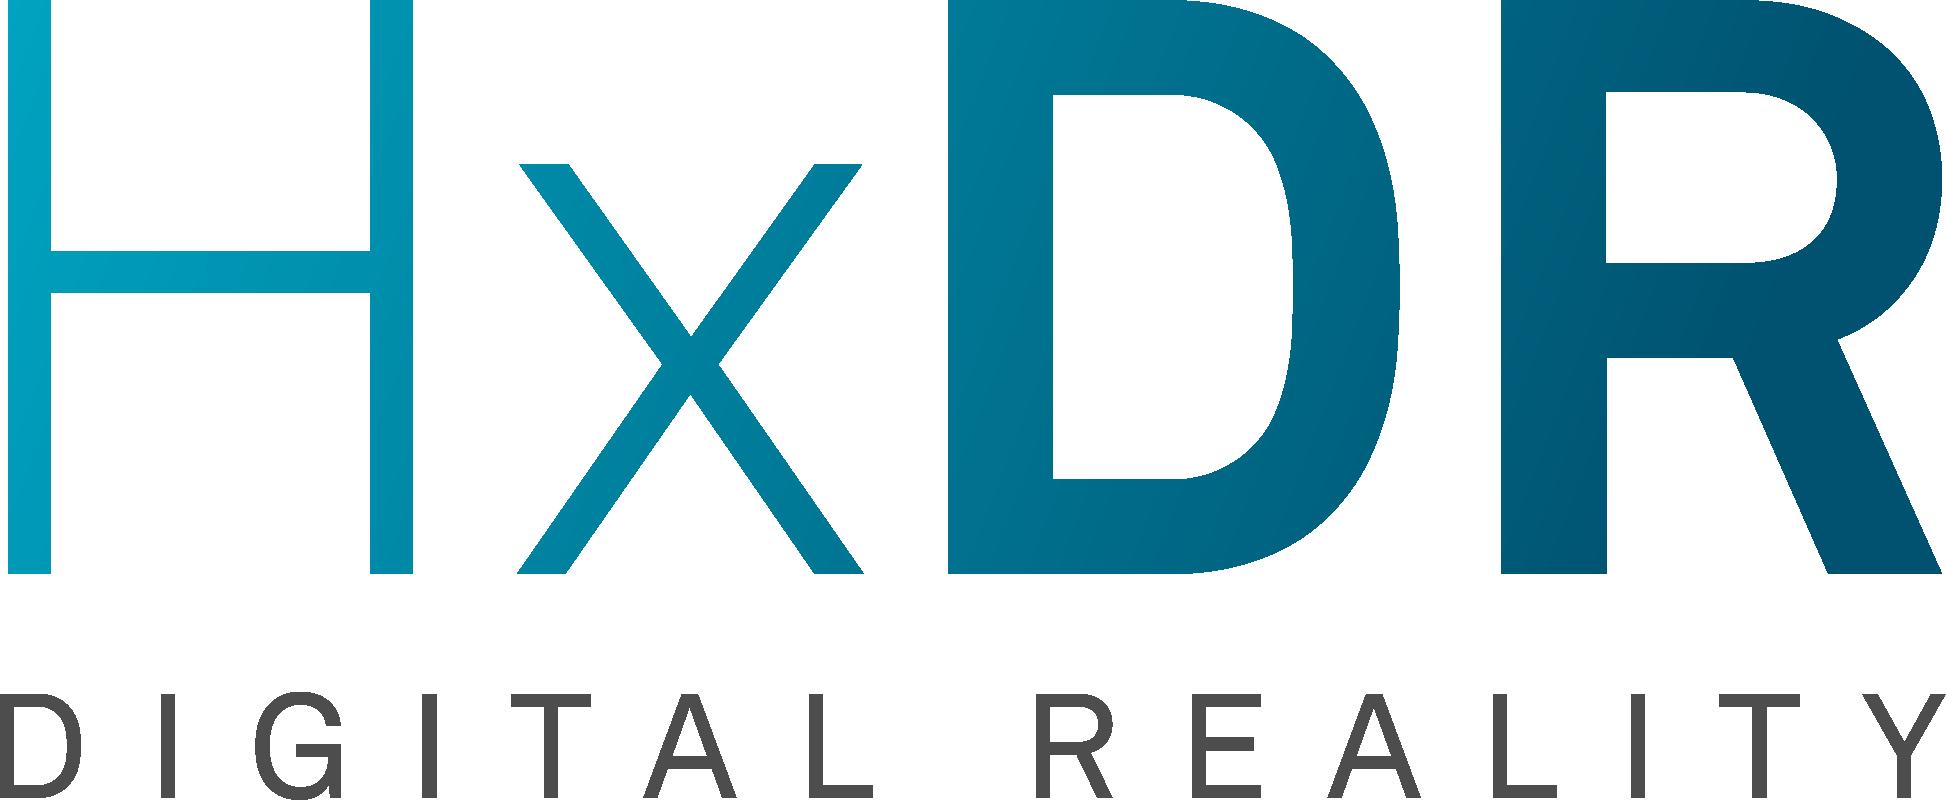 HxDR-logo-color